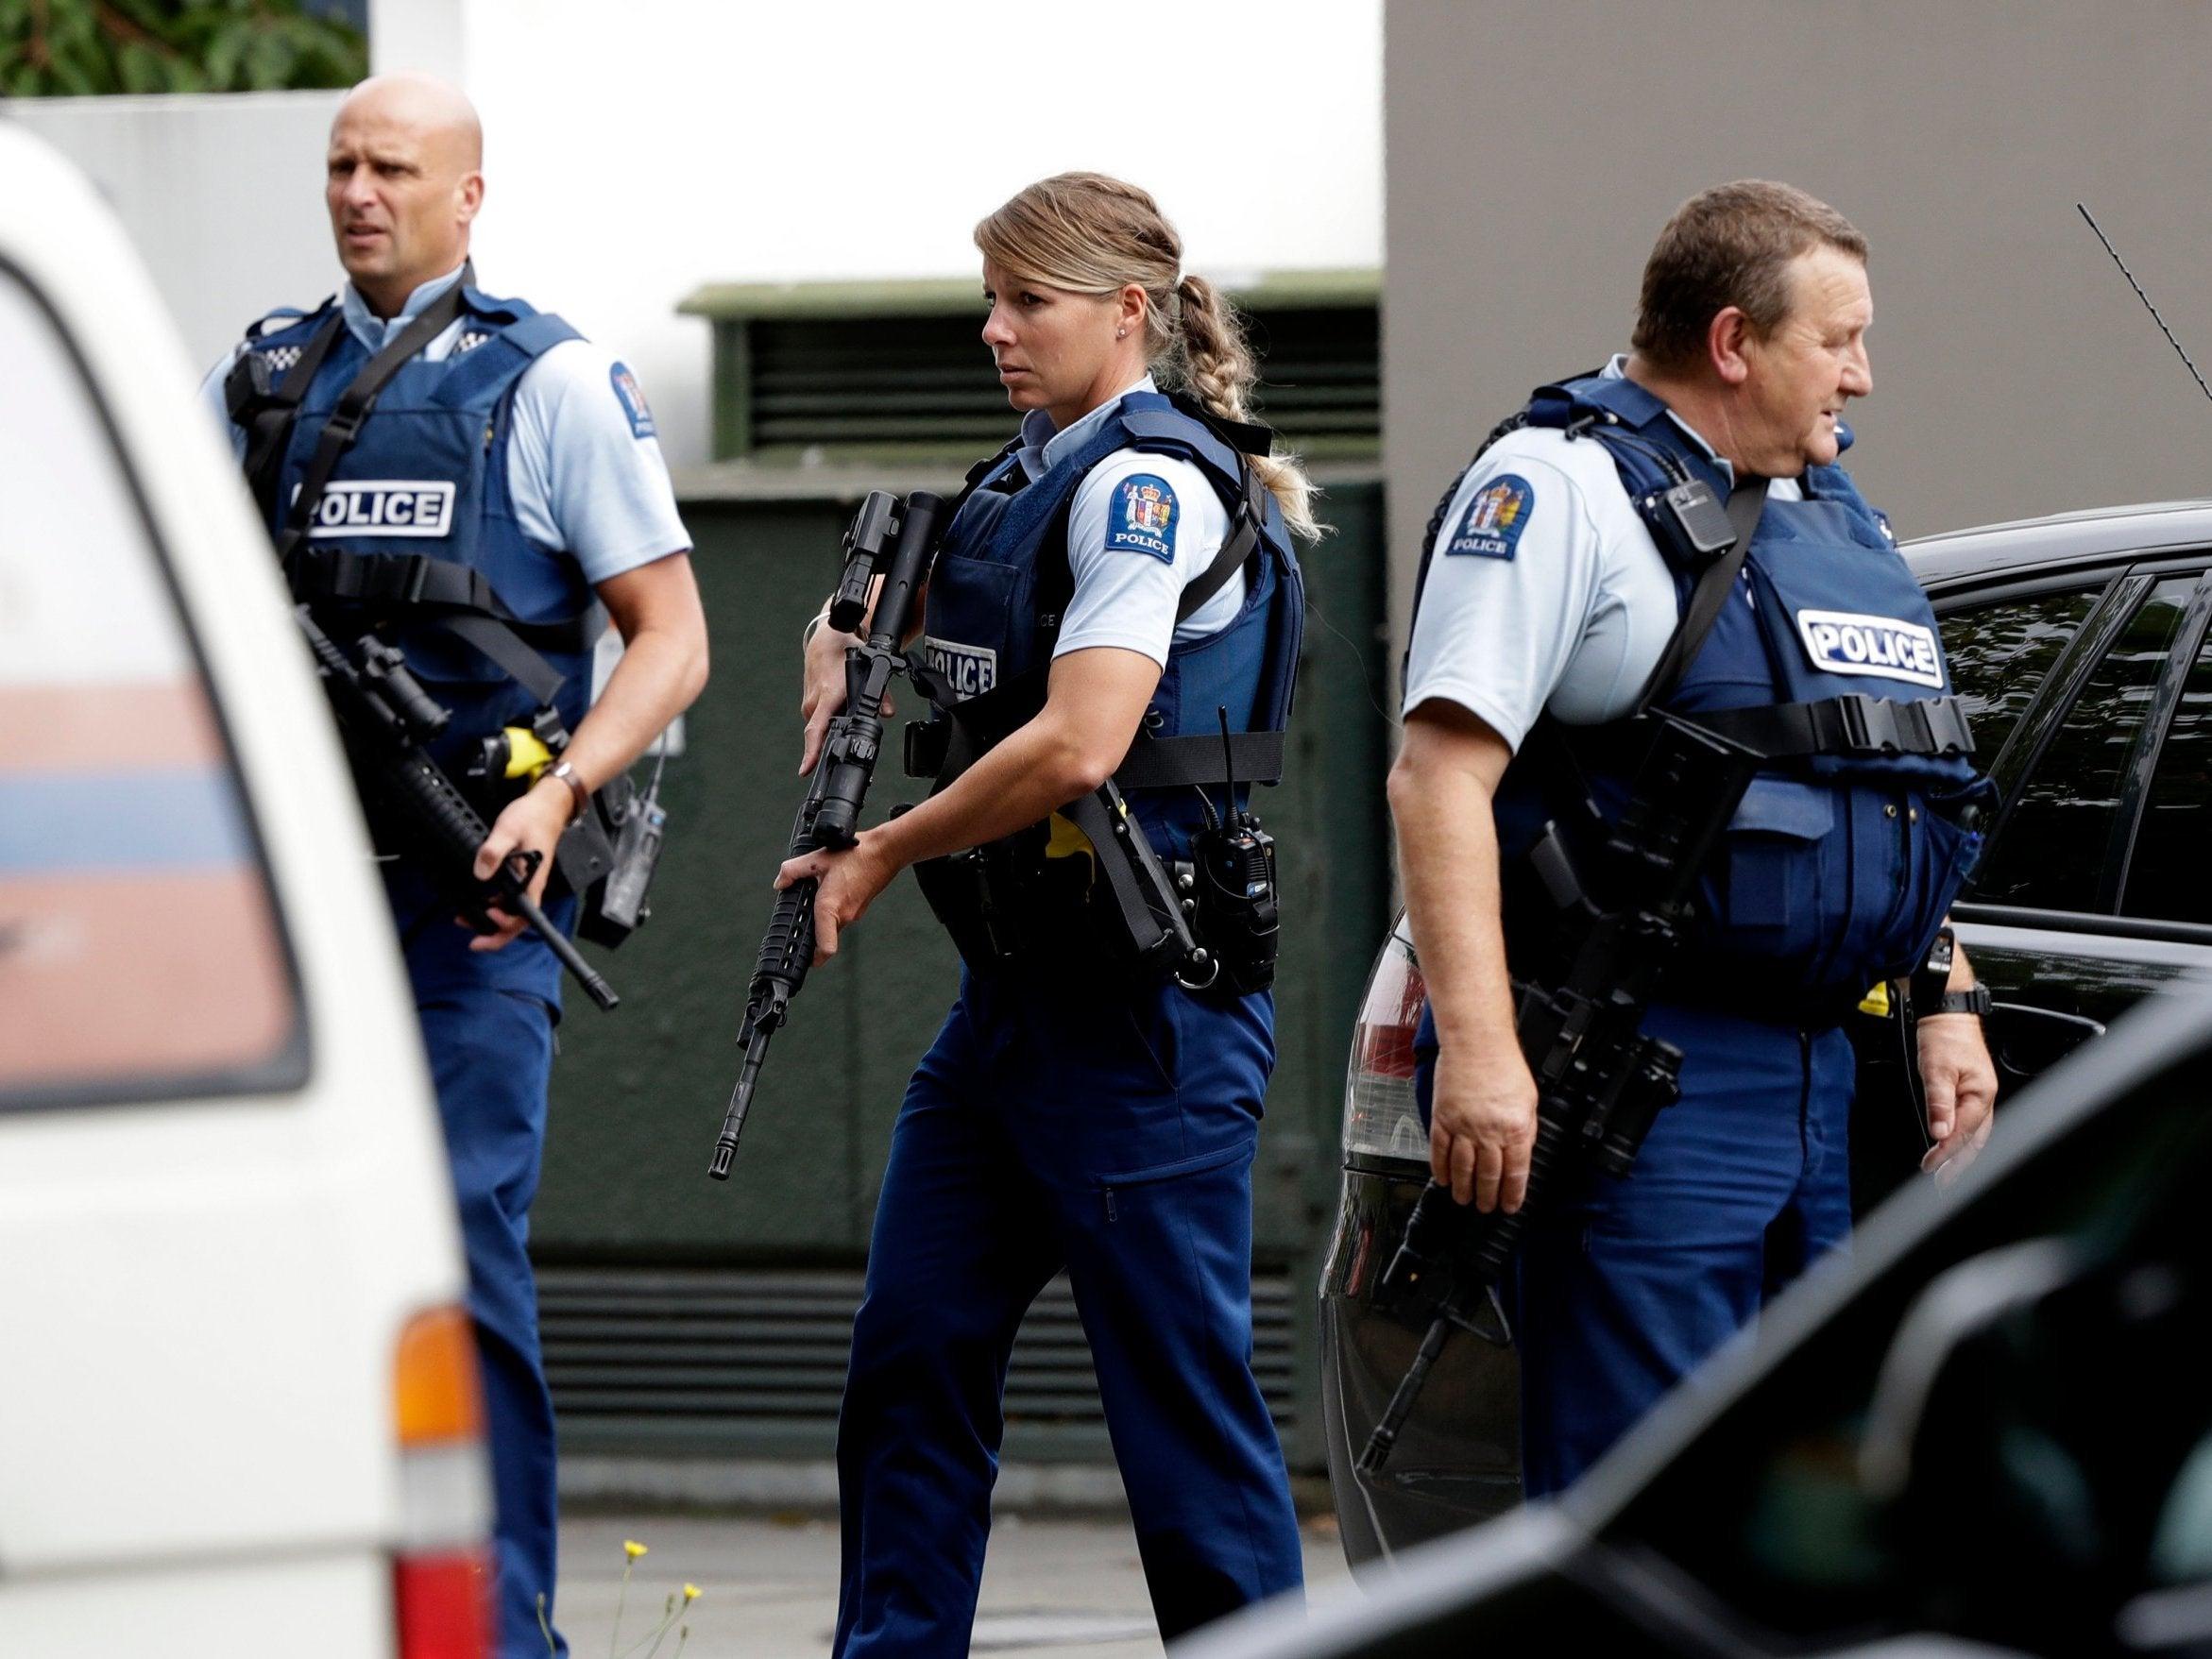 New Zealand Mosque Attack: New Zealand Mosque Attack: Armed Police Deployed In